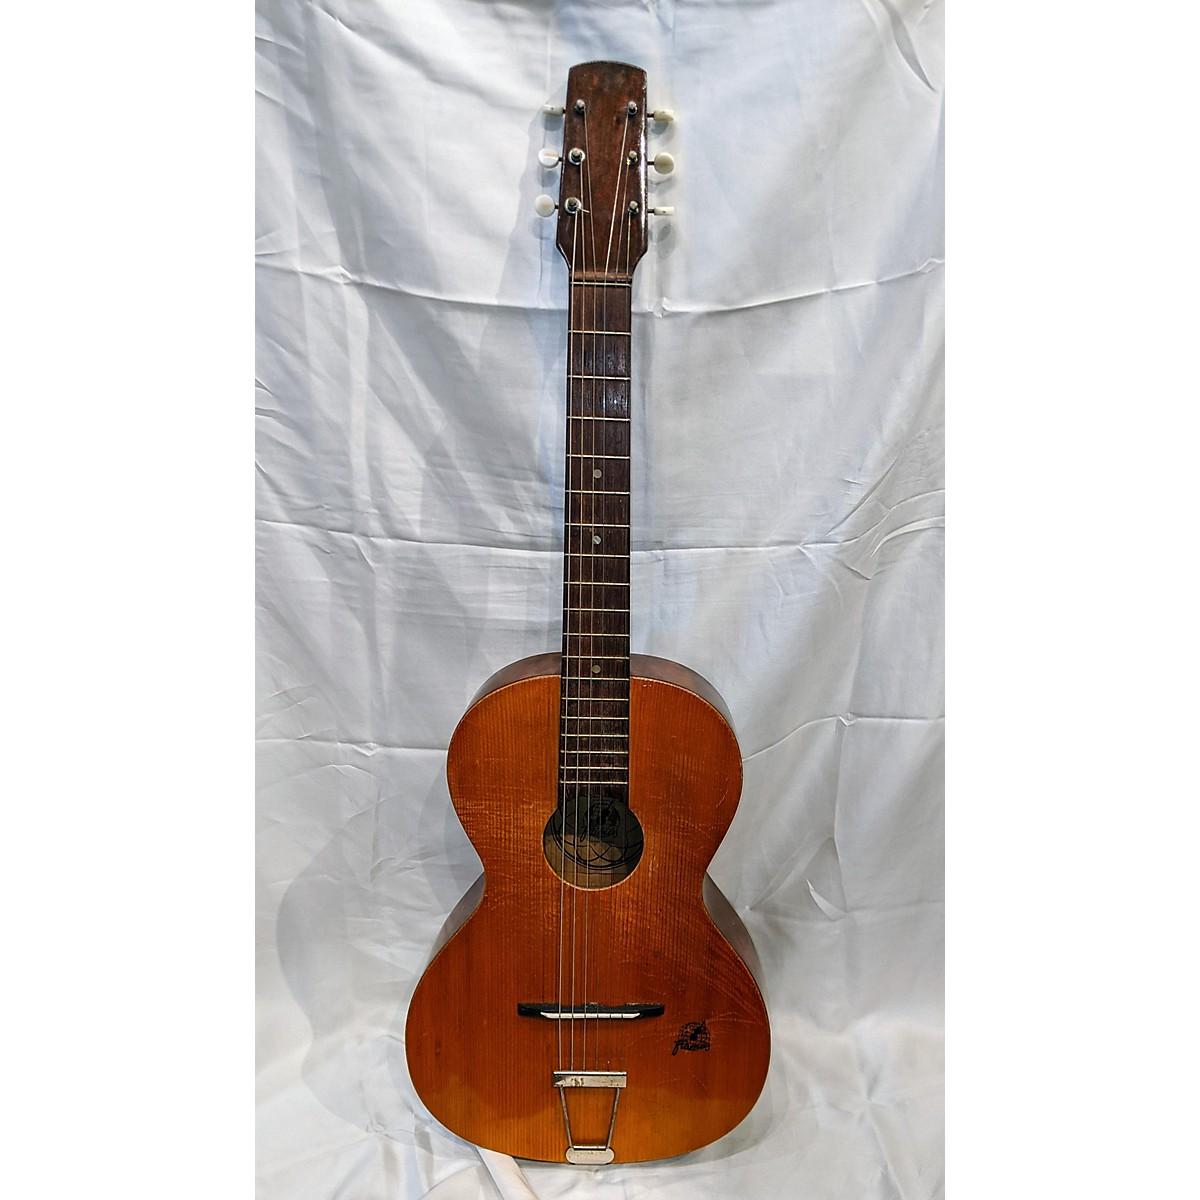 Framus 1970s Student Series Acoustic Guitar